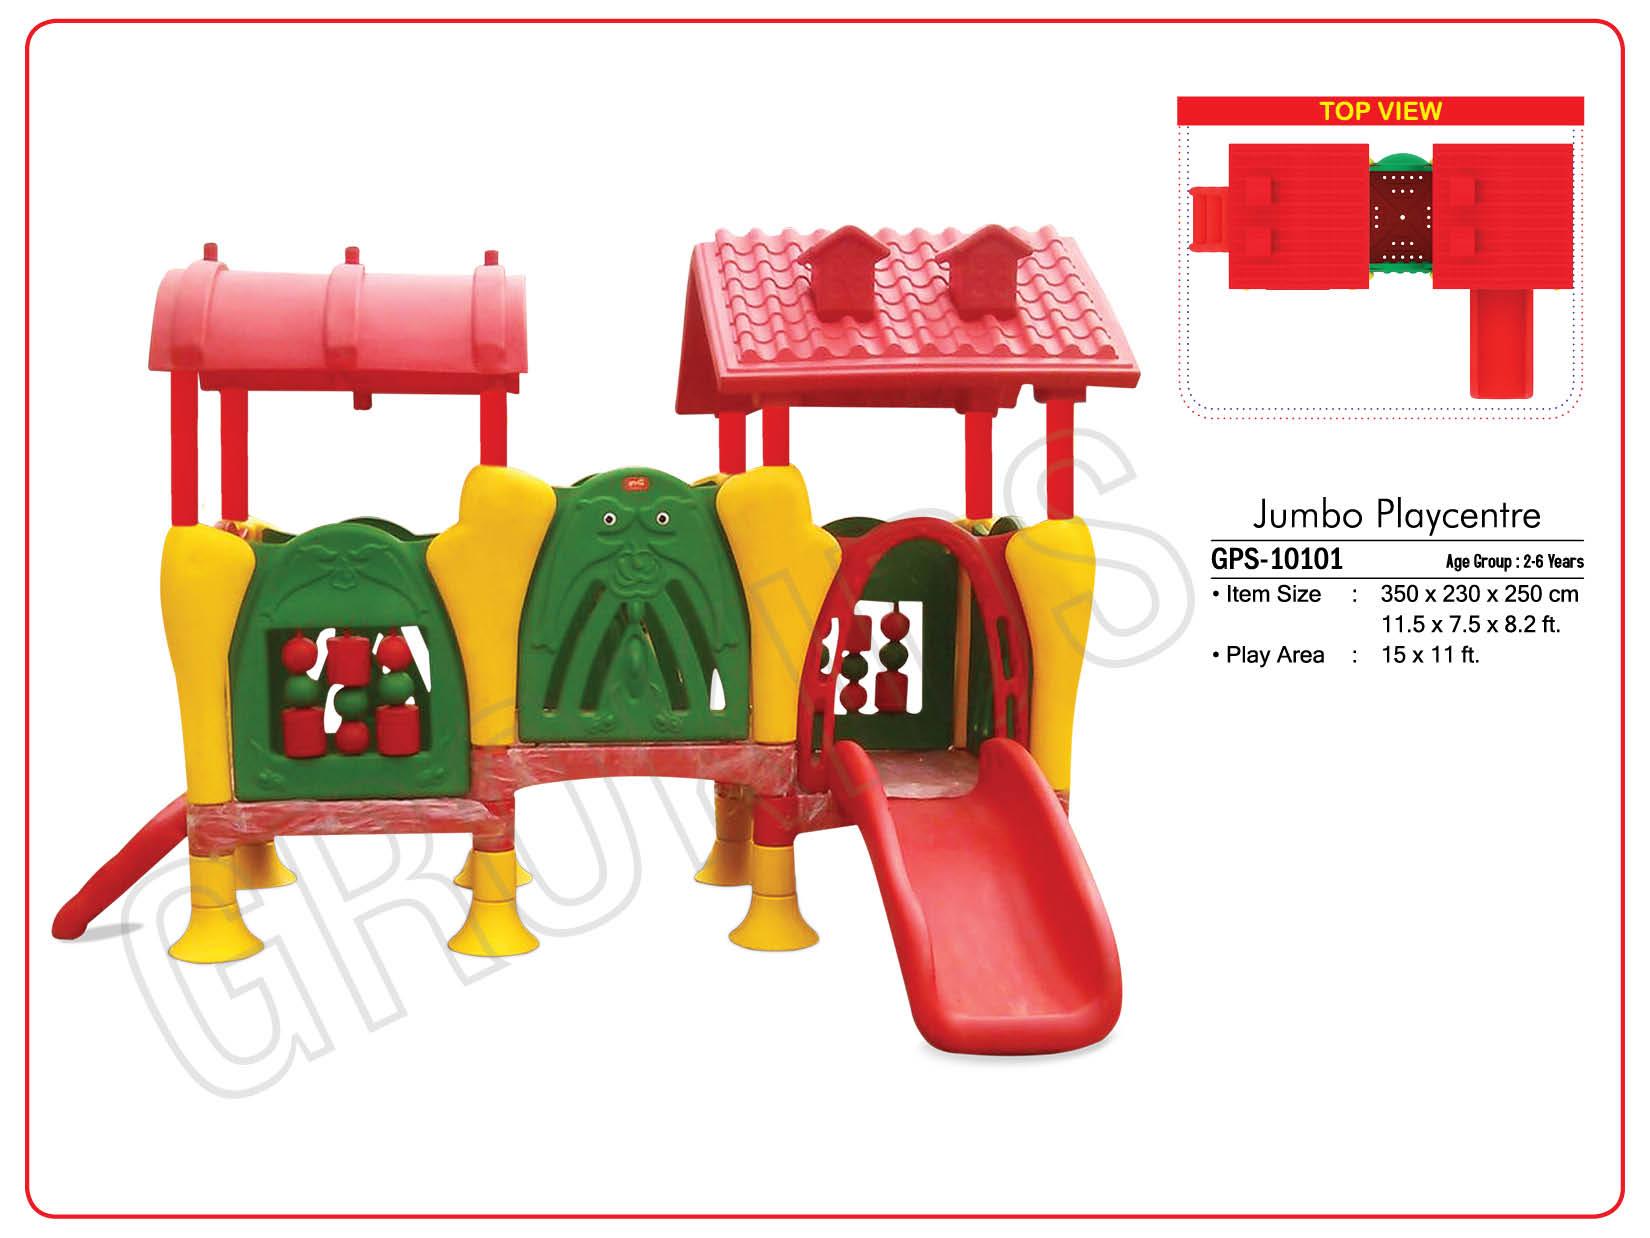 Jumbo Playcentre